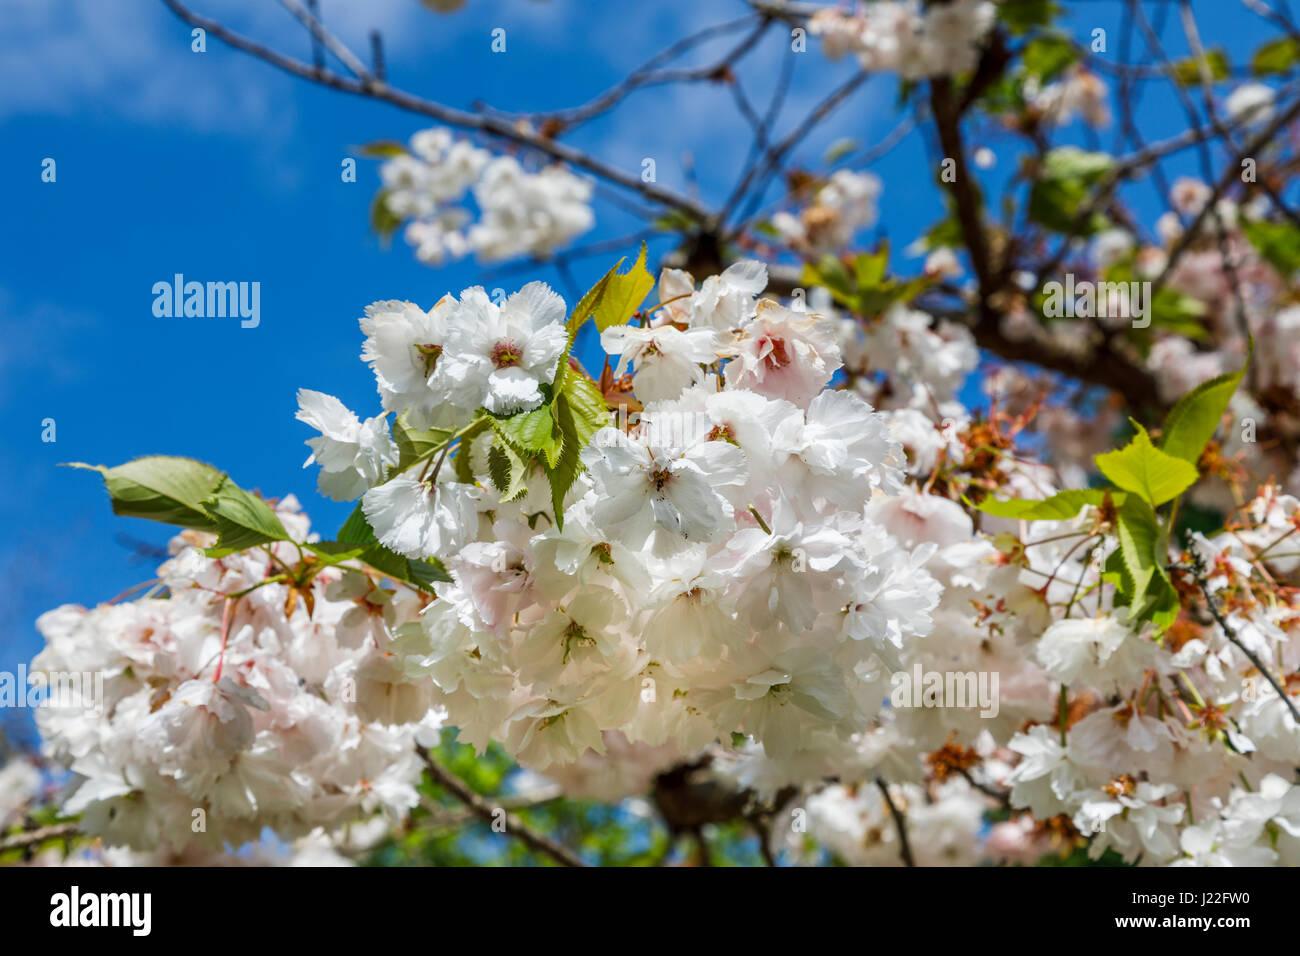 Ornamental White Flowering Cherry Tree Blossom Malus In Flower